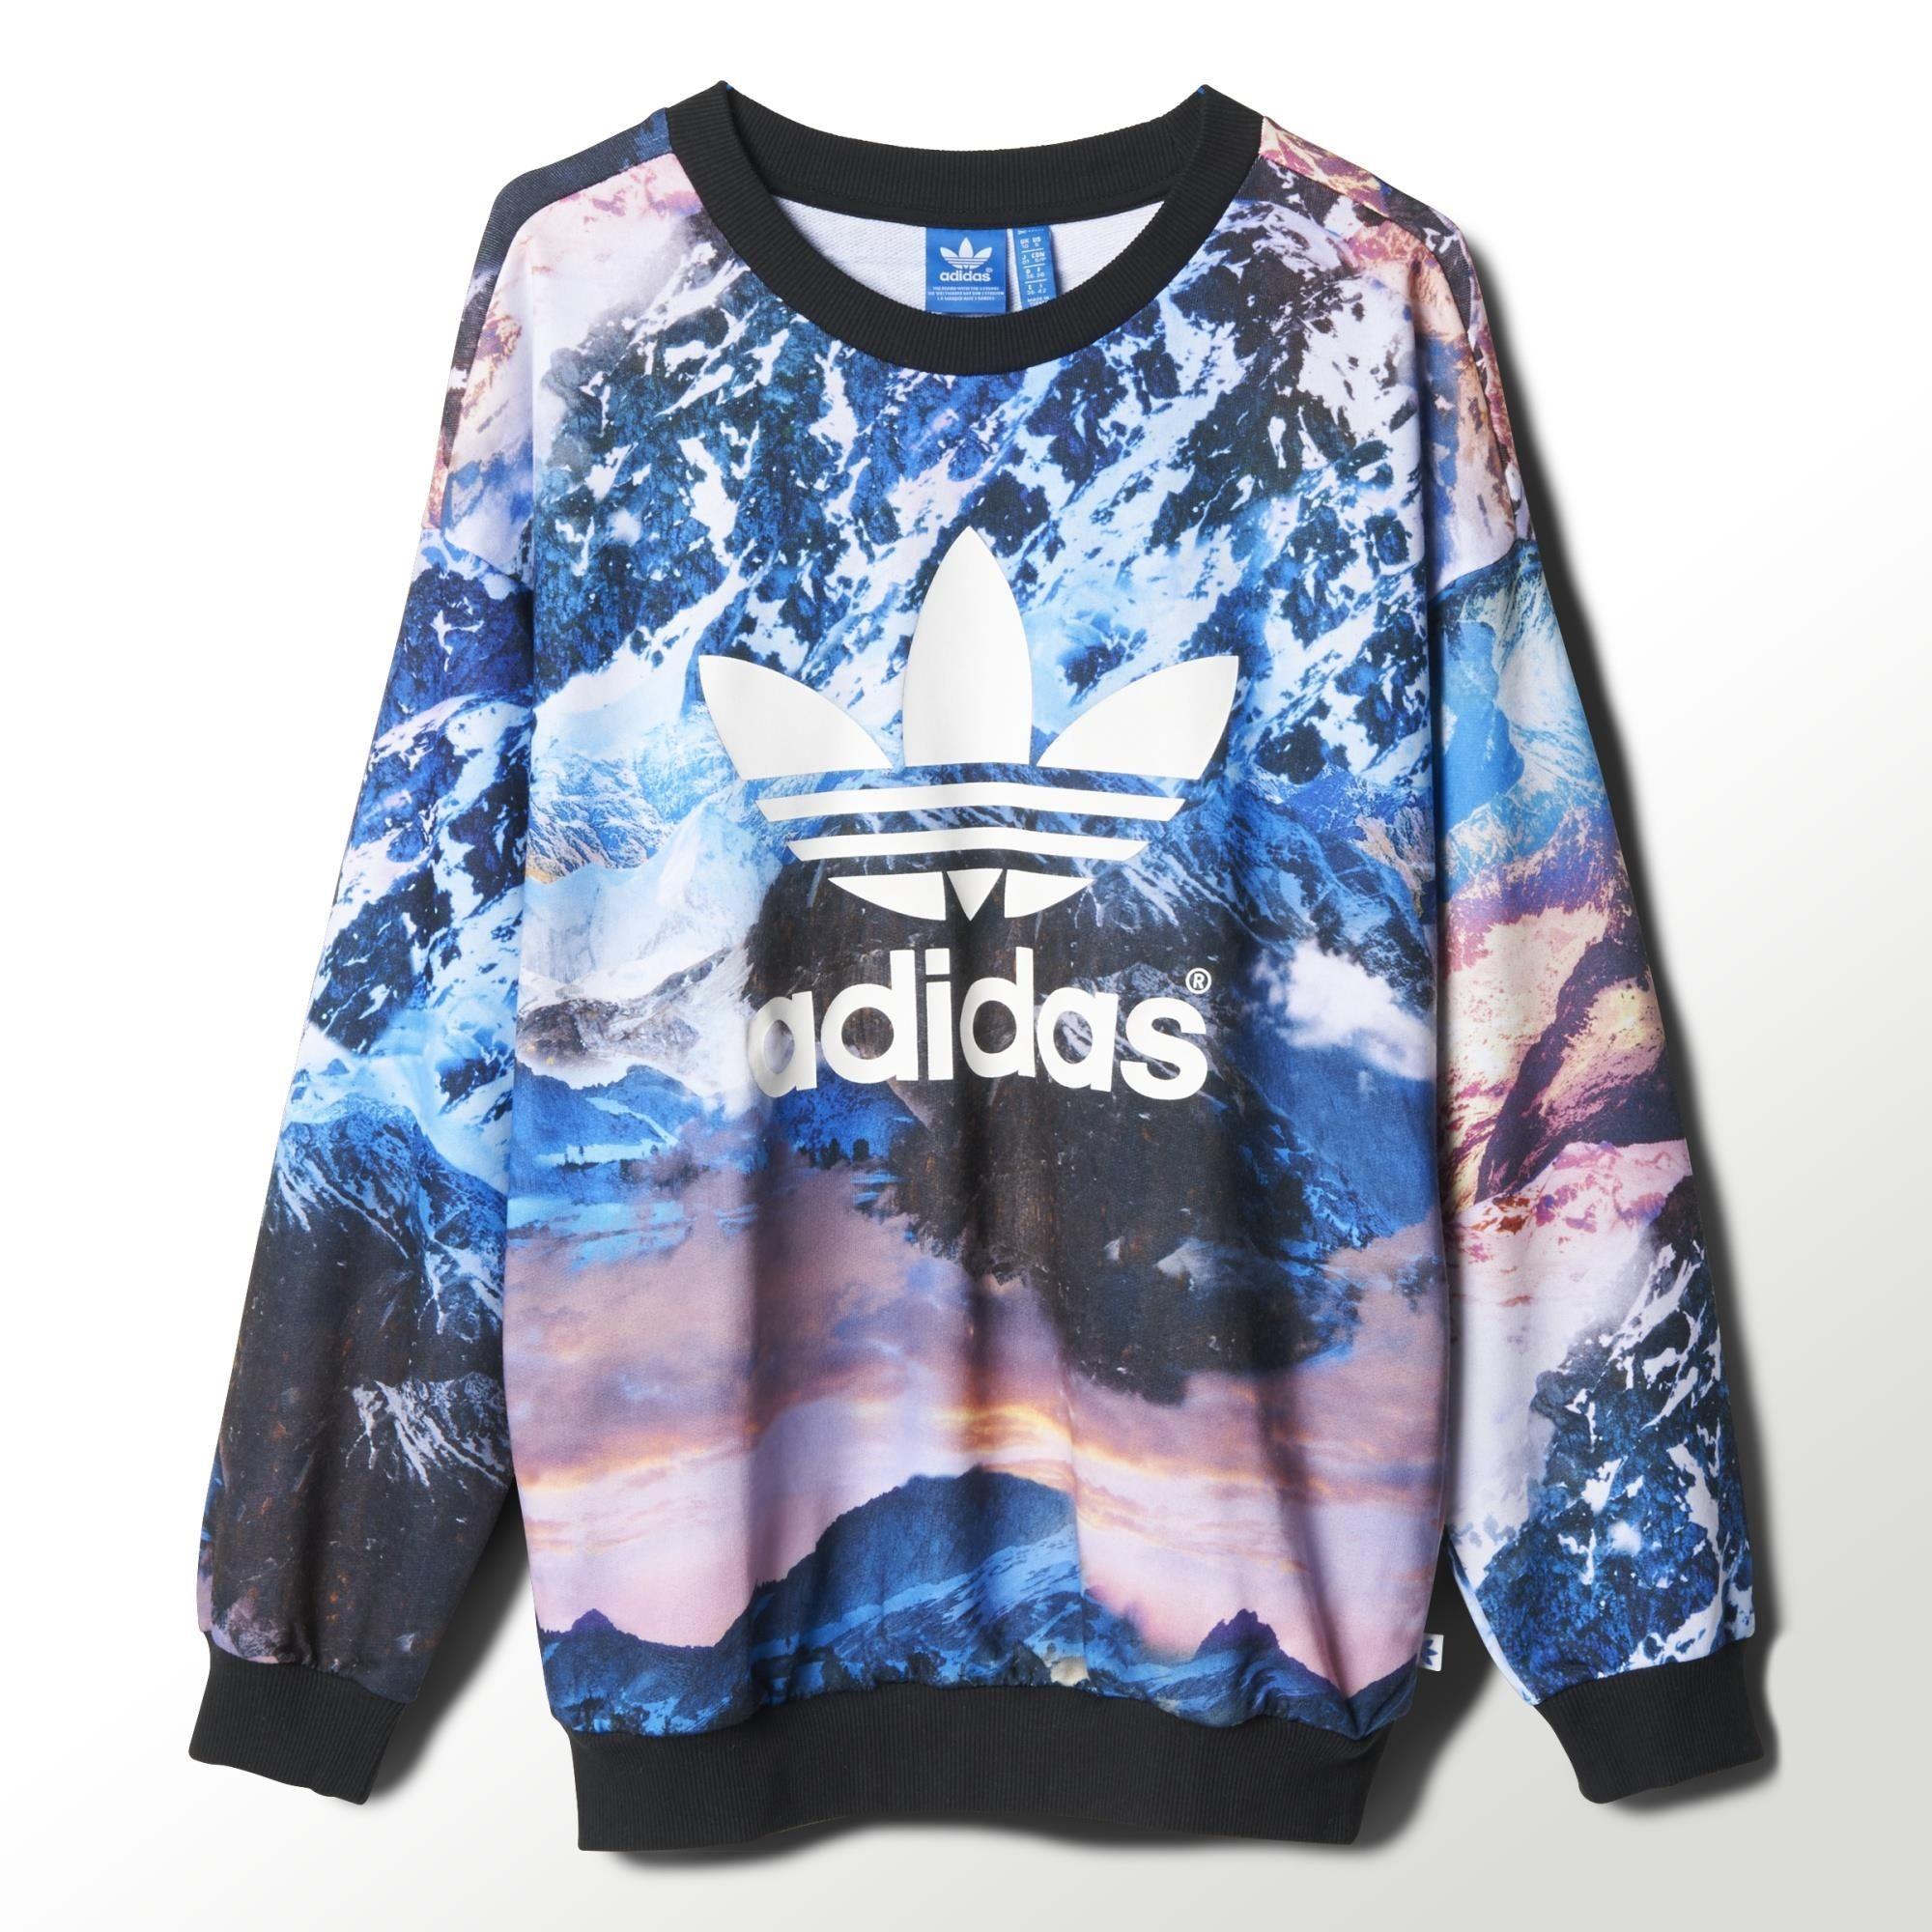 Adidas Mountain Clash Sweater Adidas Us Adidas Originals Women Sweatshirts Adidas Sweater [ 2000 x 2000 Pixel ]